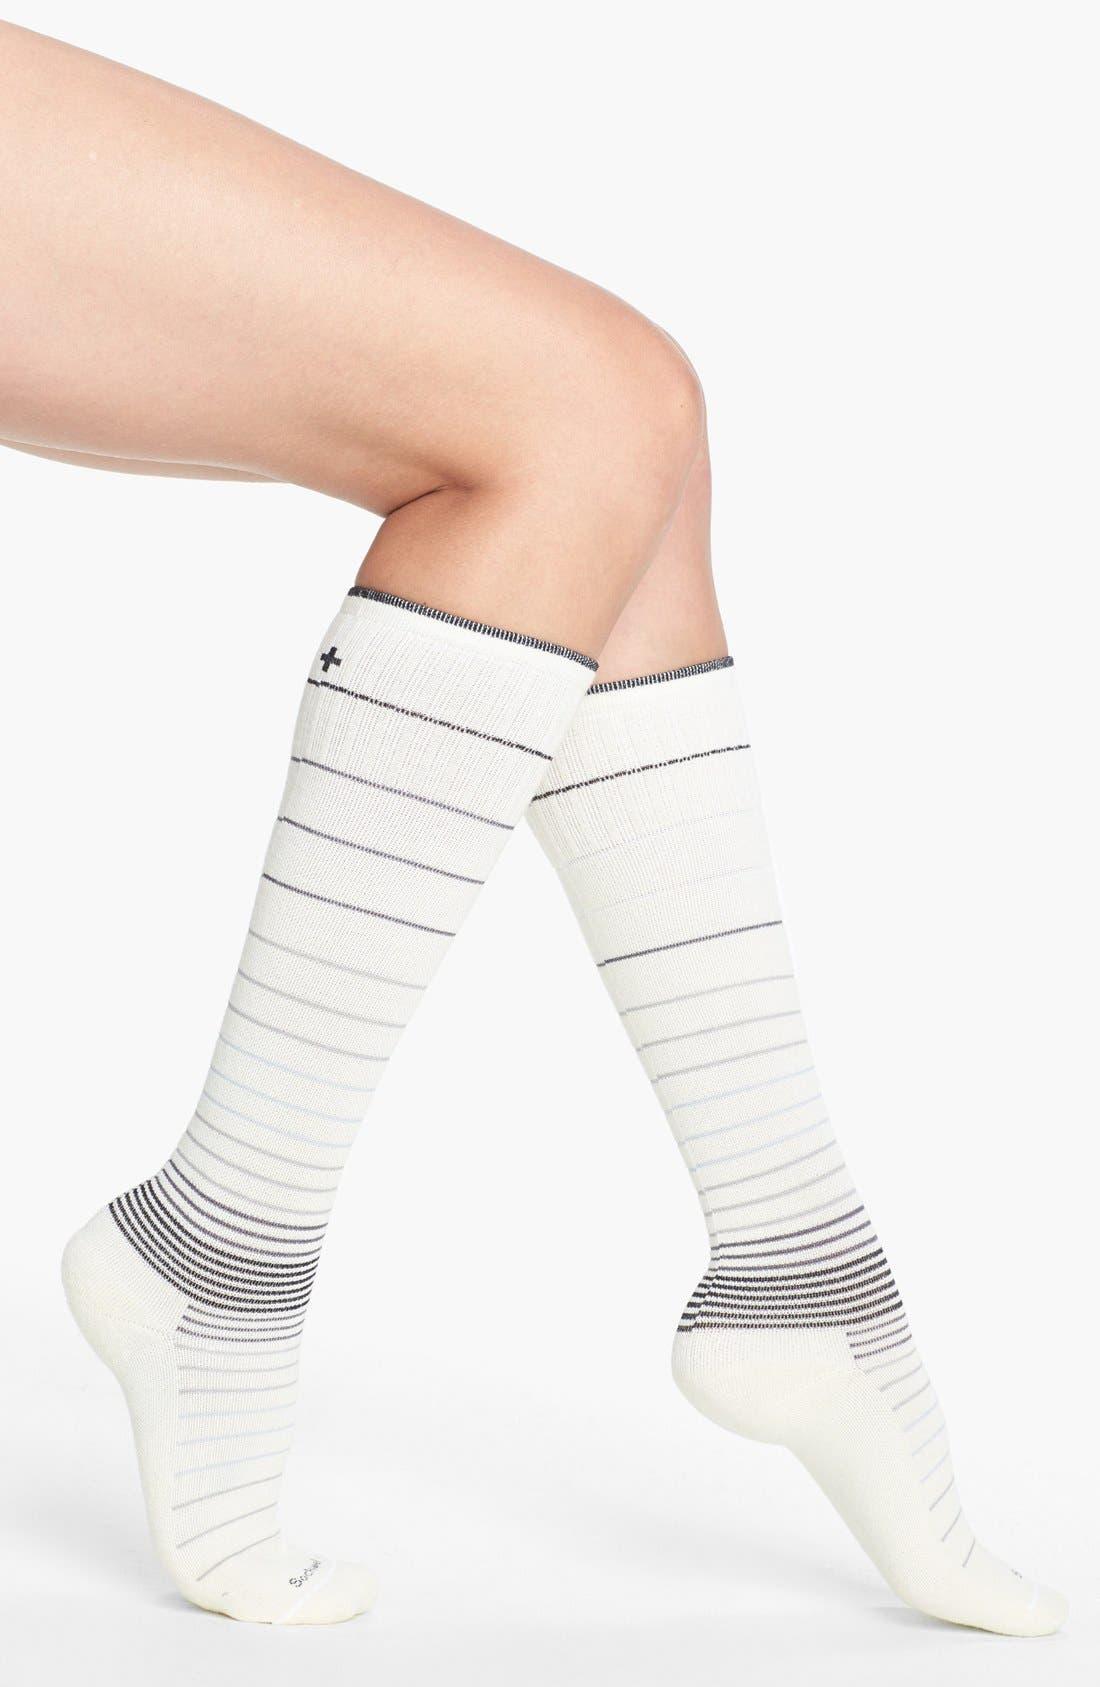 Main Image - Sockwell Goodhew - Circulator Compression Socks